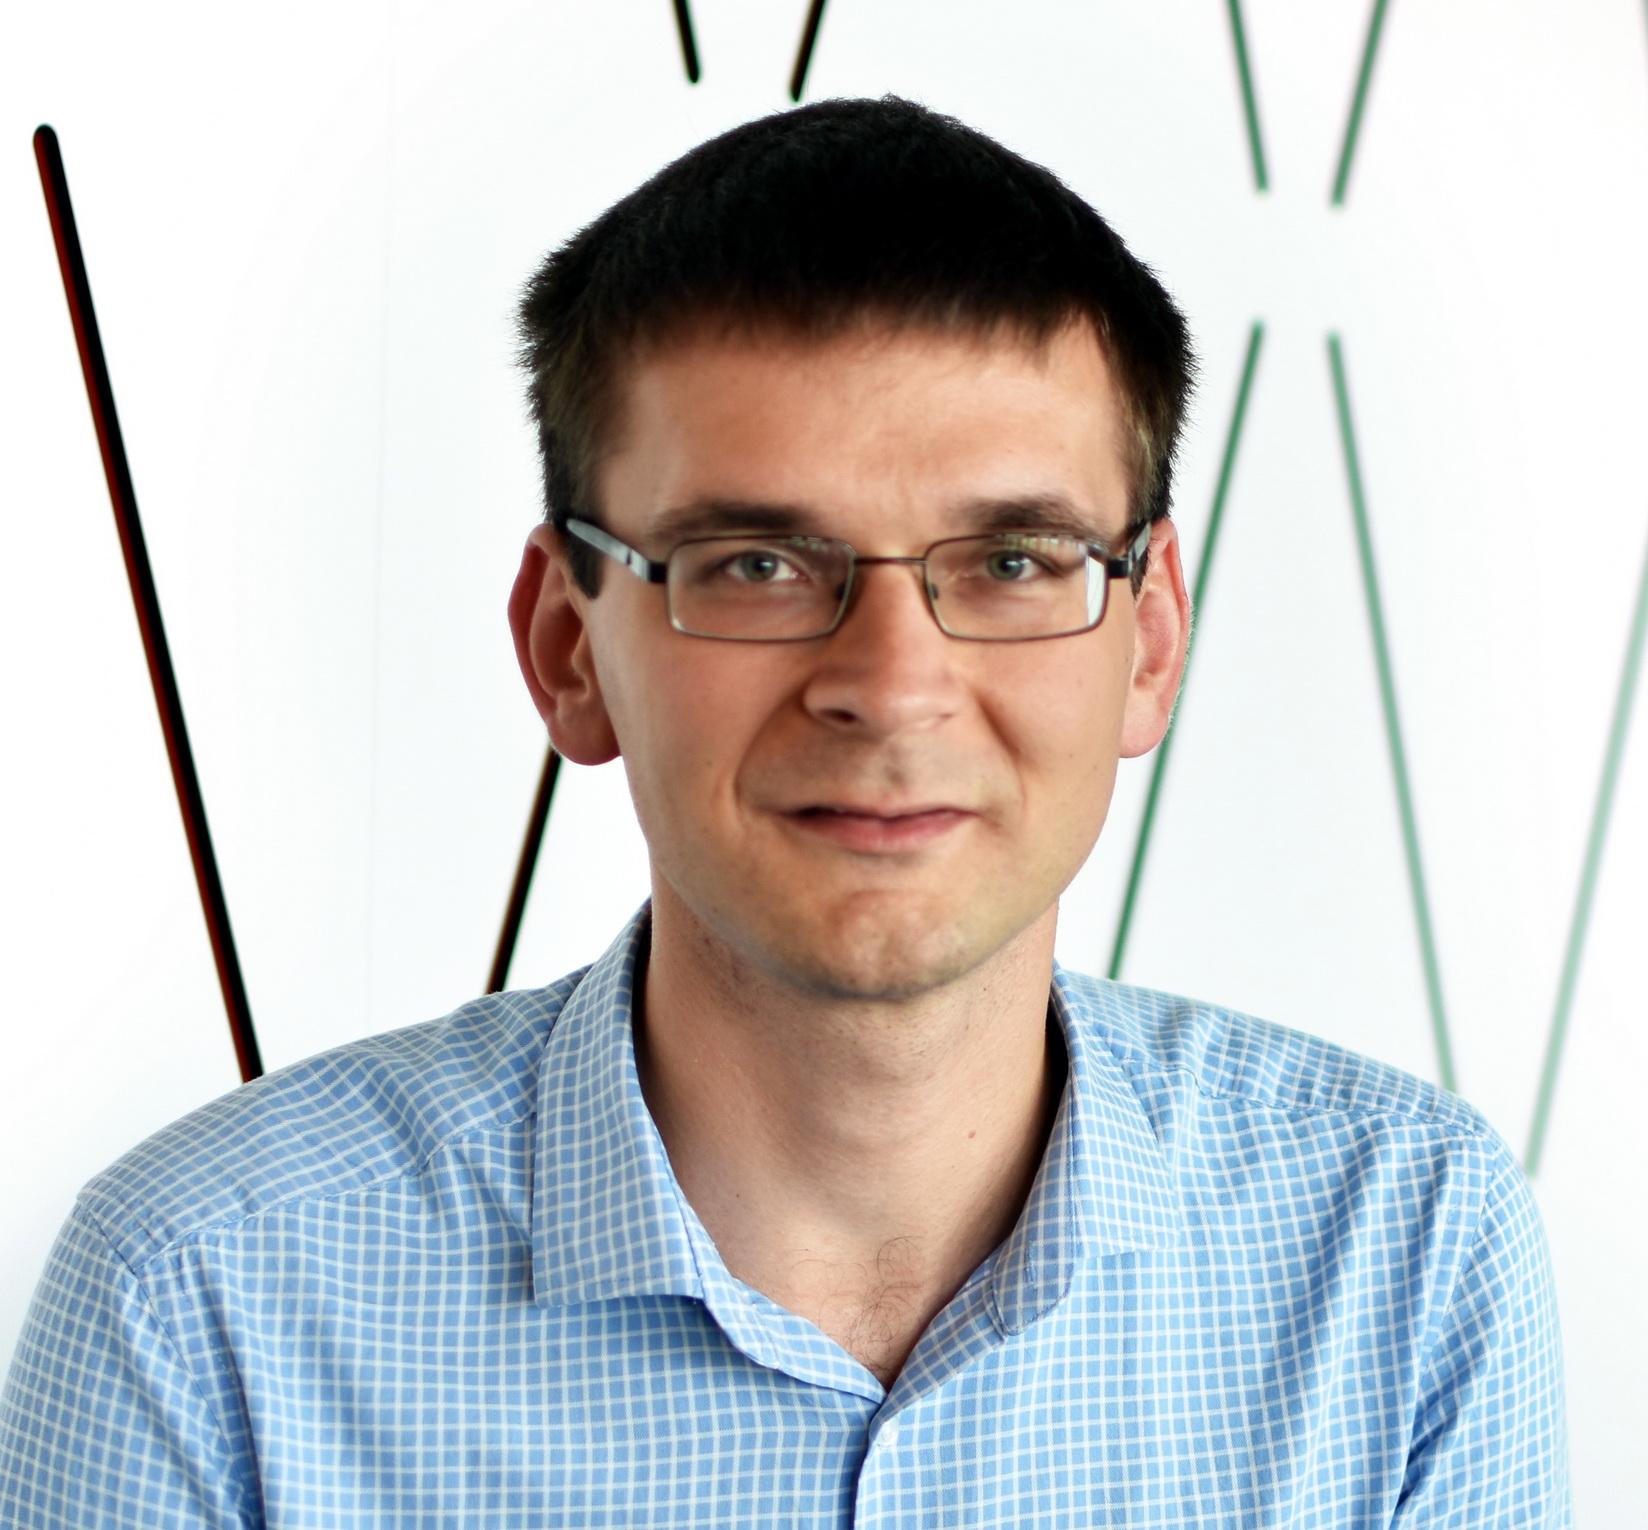 Tomáš Janotík